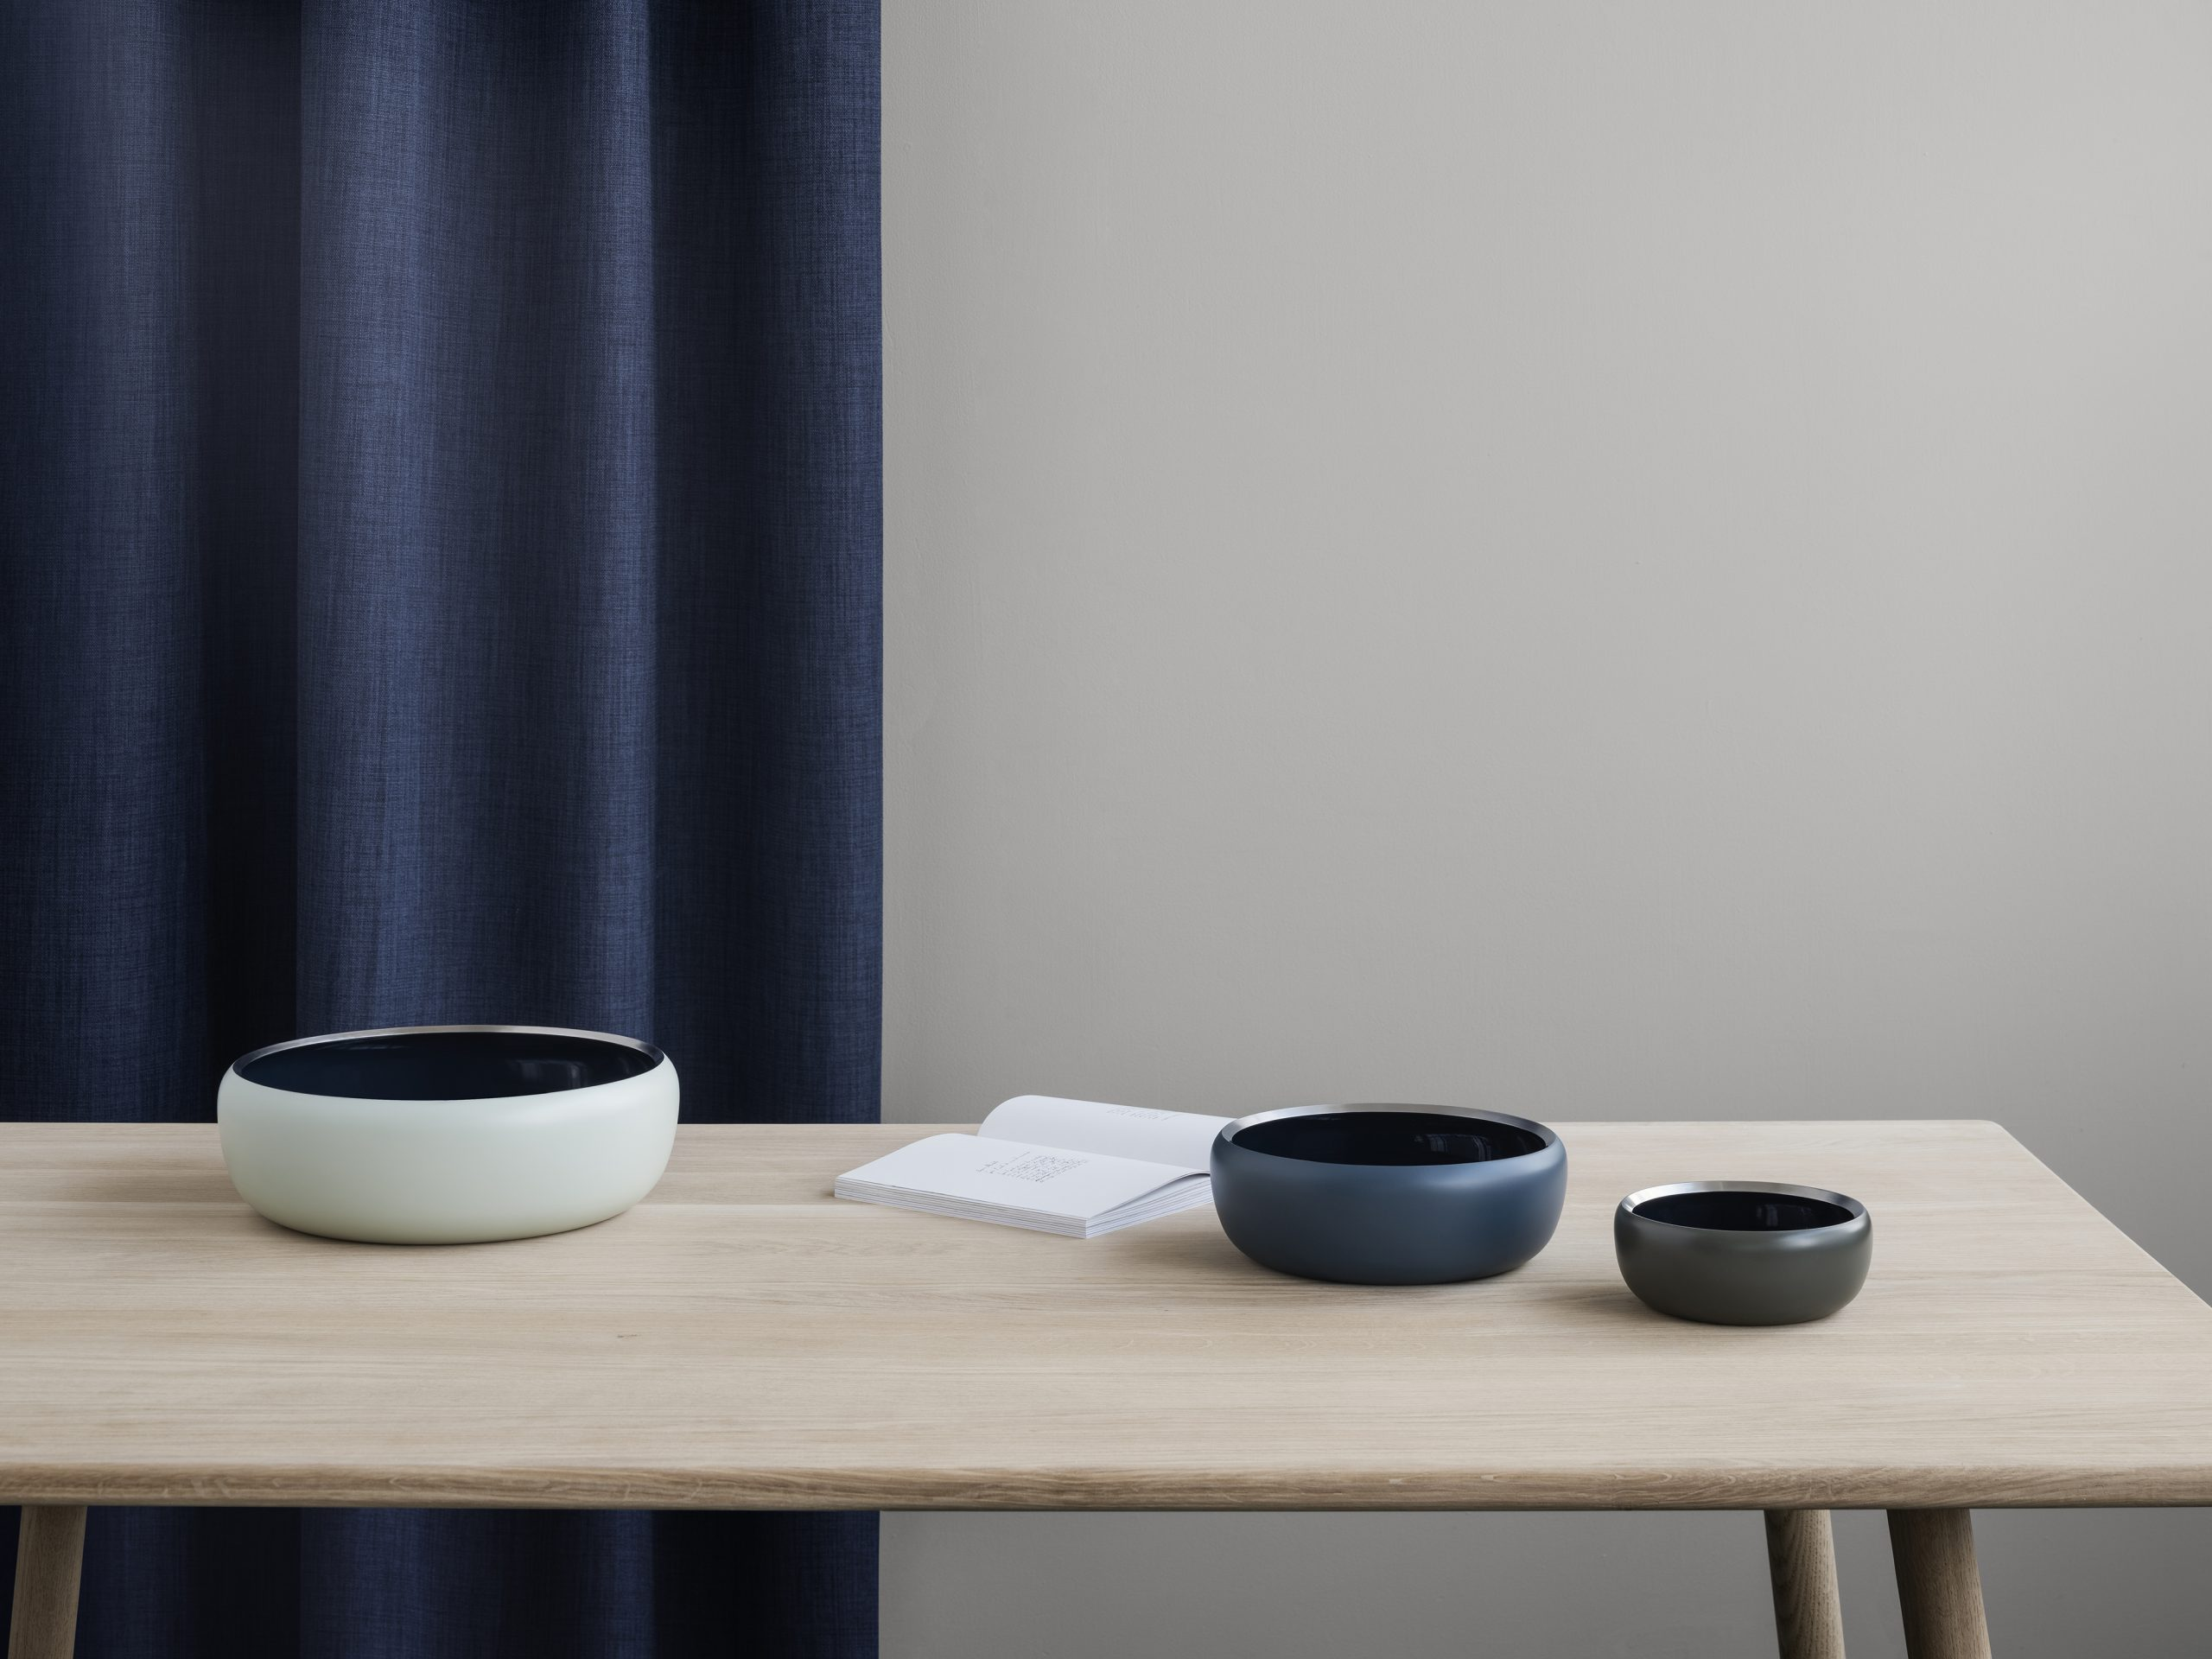 Ora bowls in Midnight blue by Debiasi Sandri for Stelton